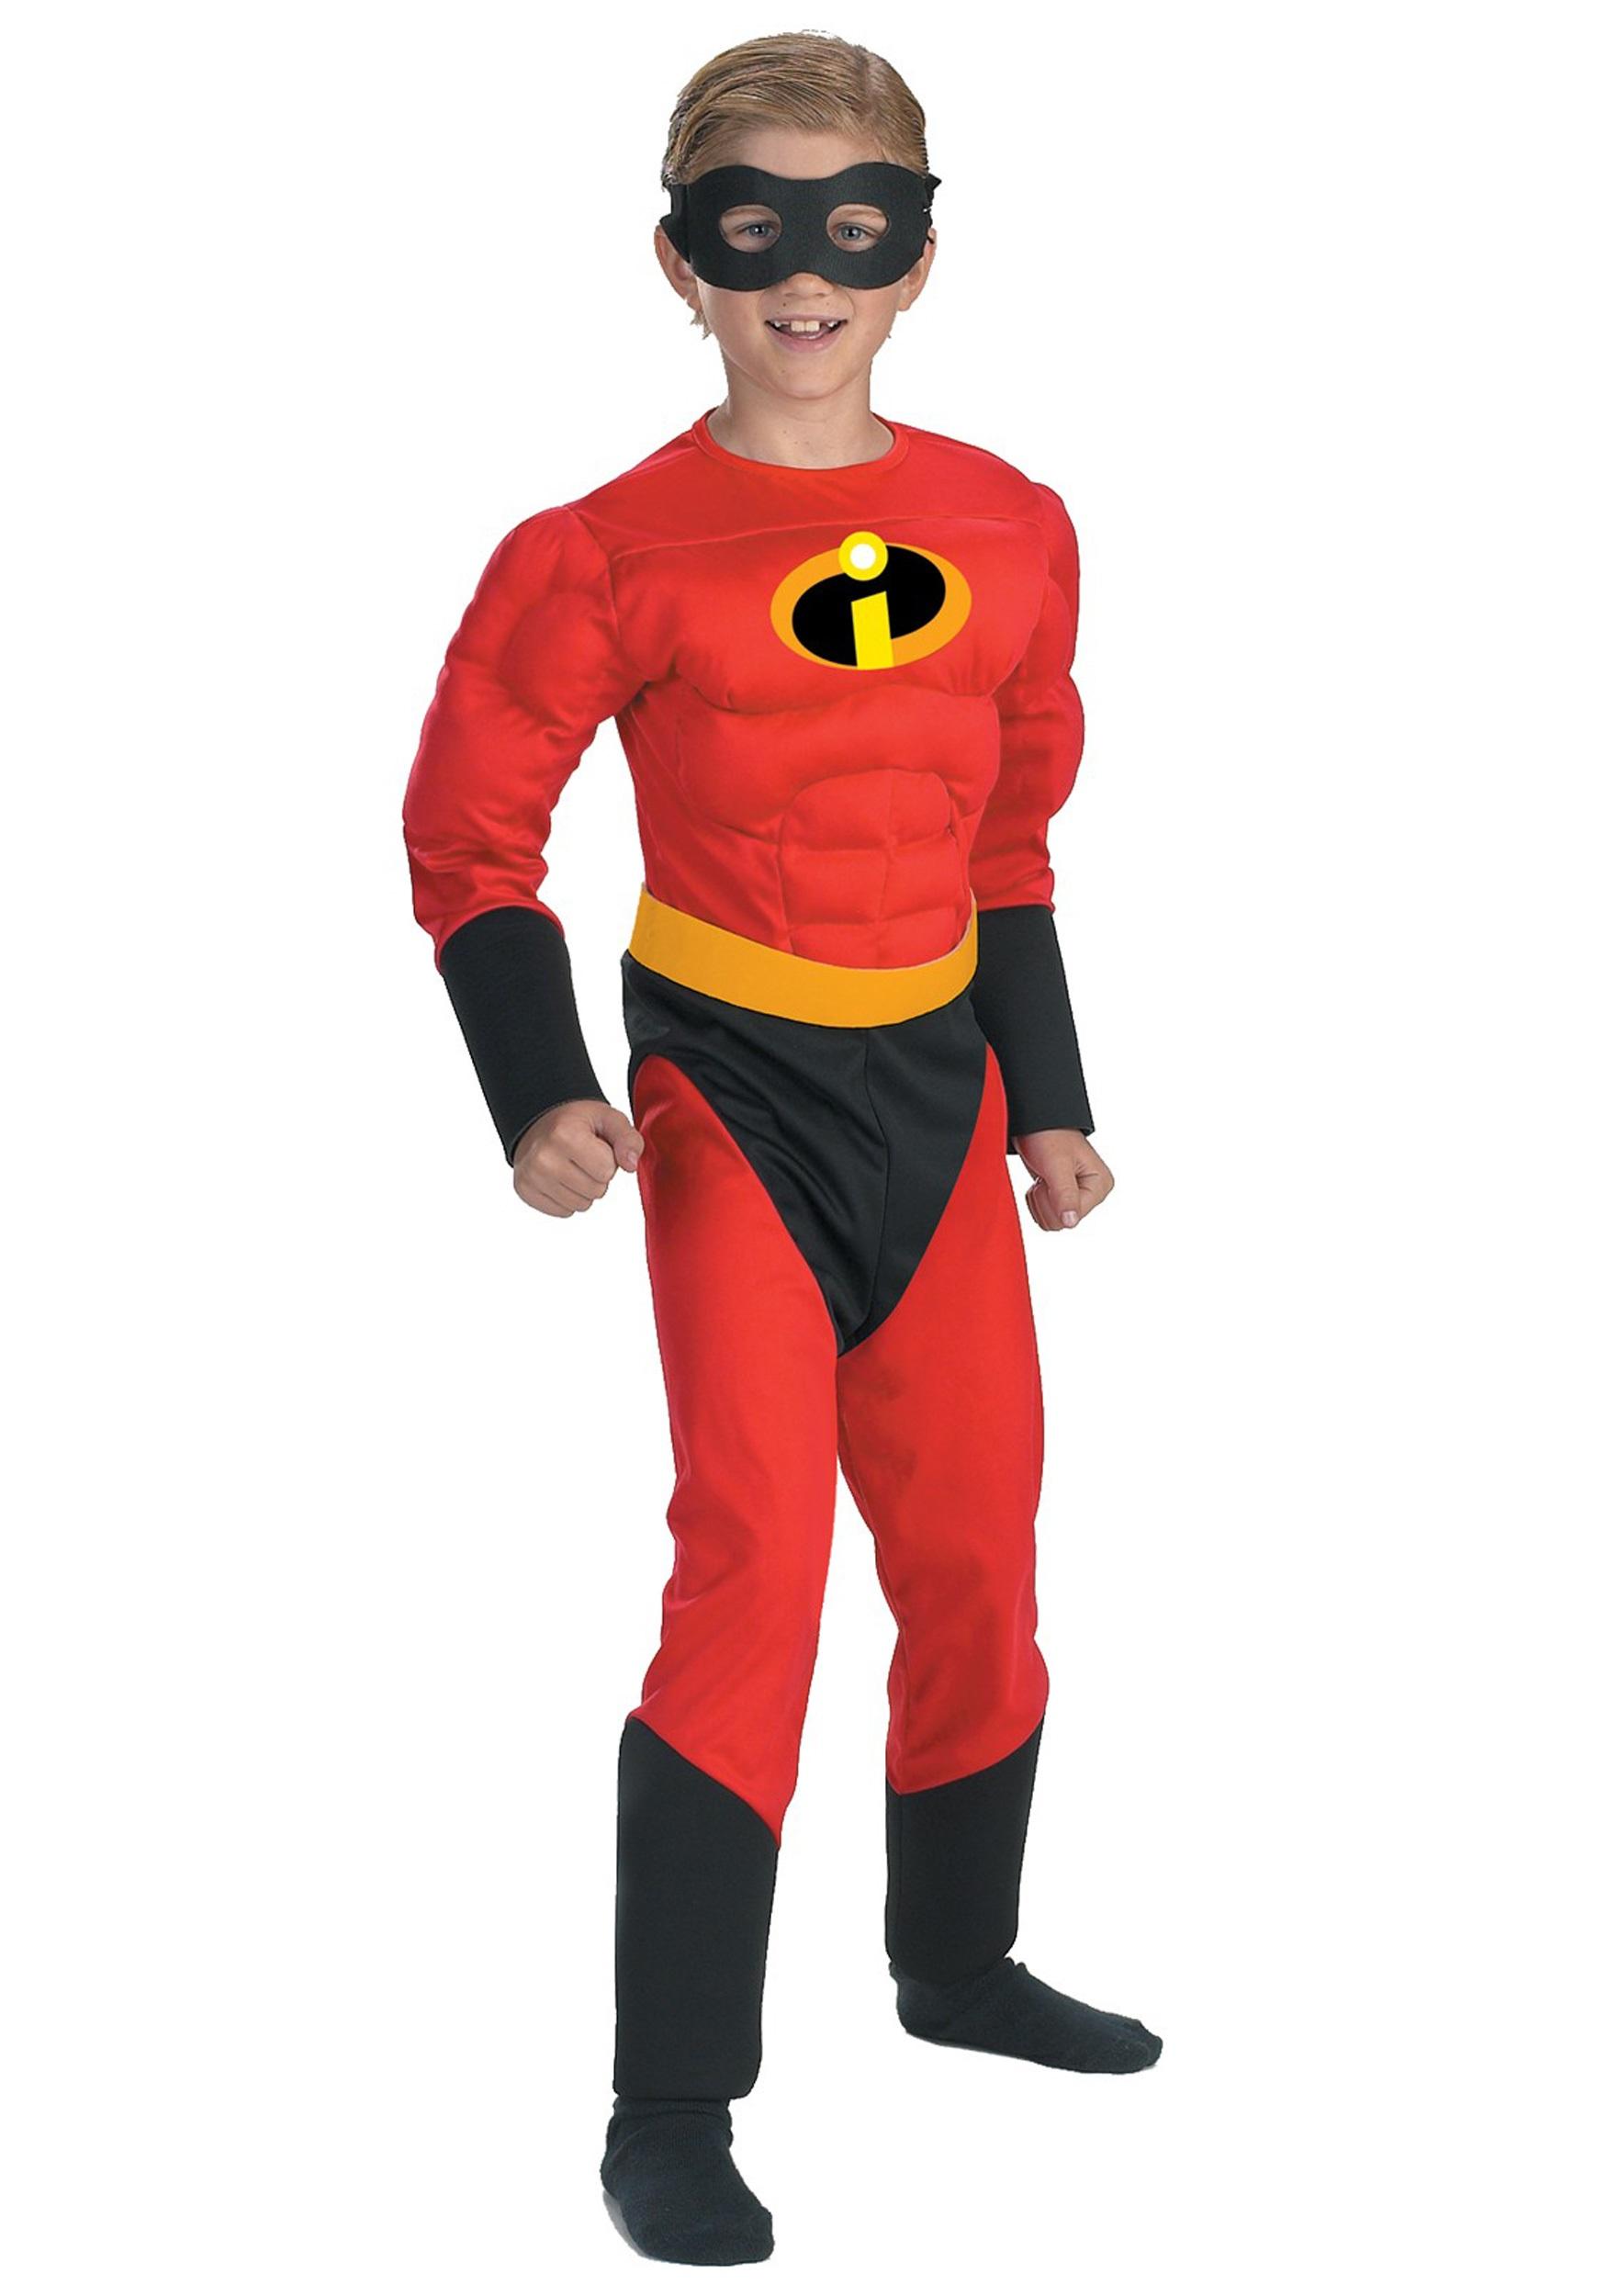 Incredibles Dash Costume Boys Incredibles Dash Costume